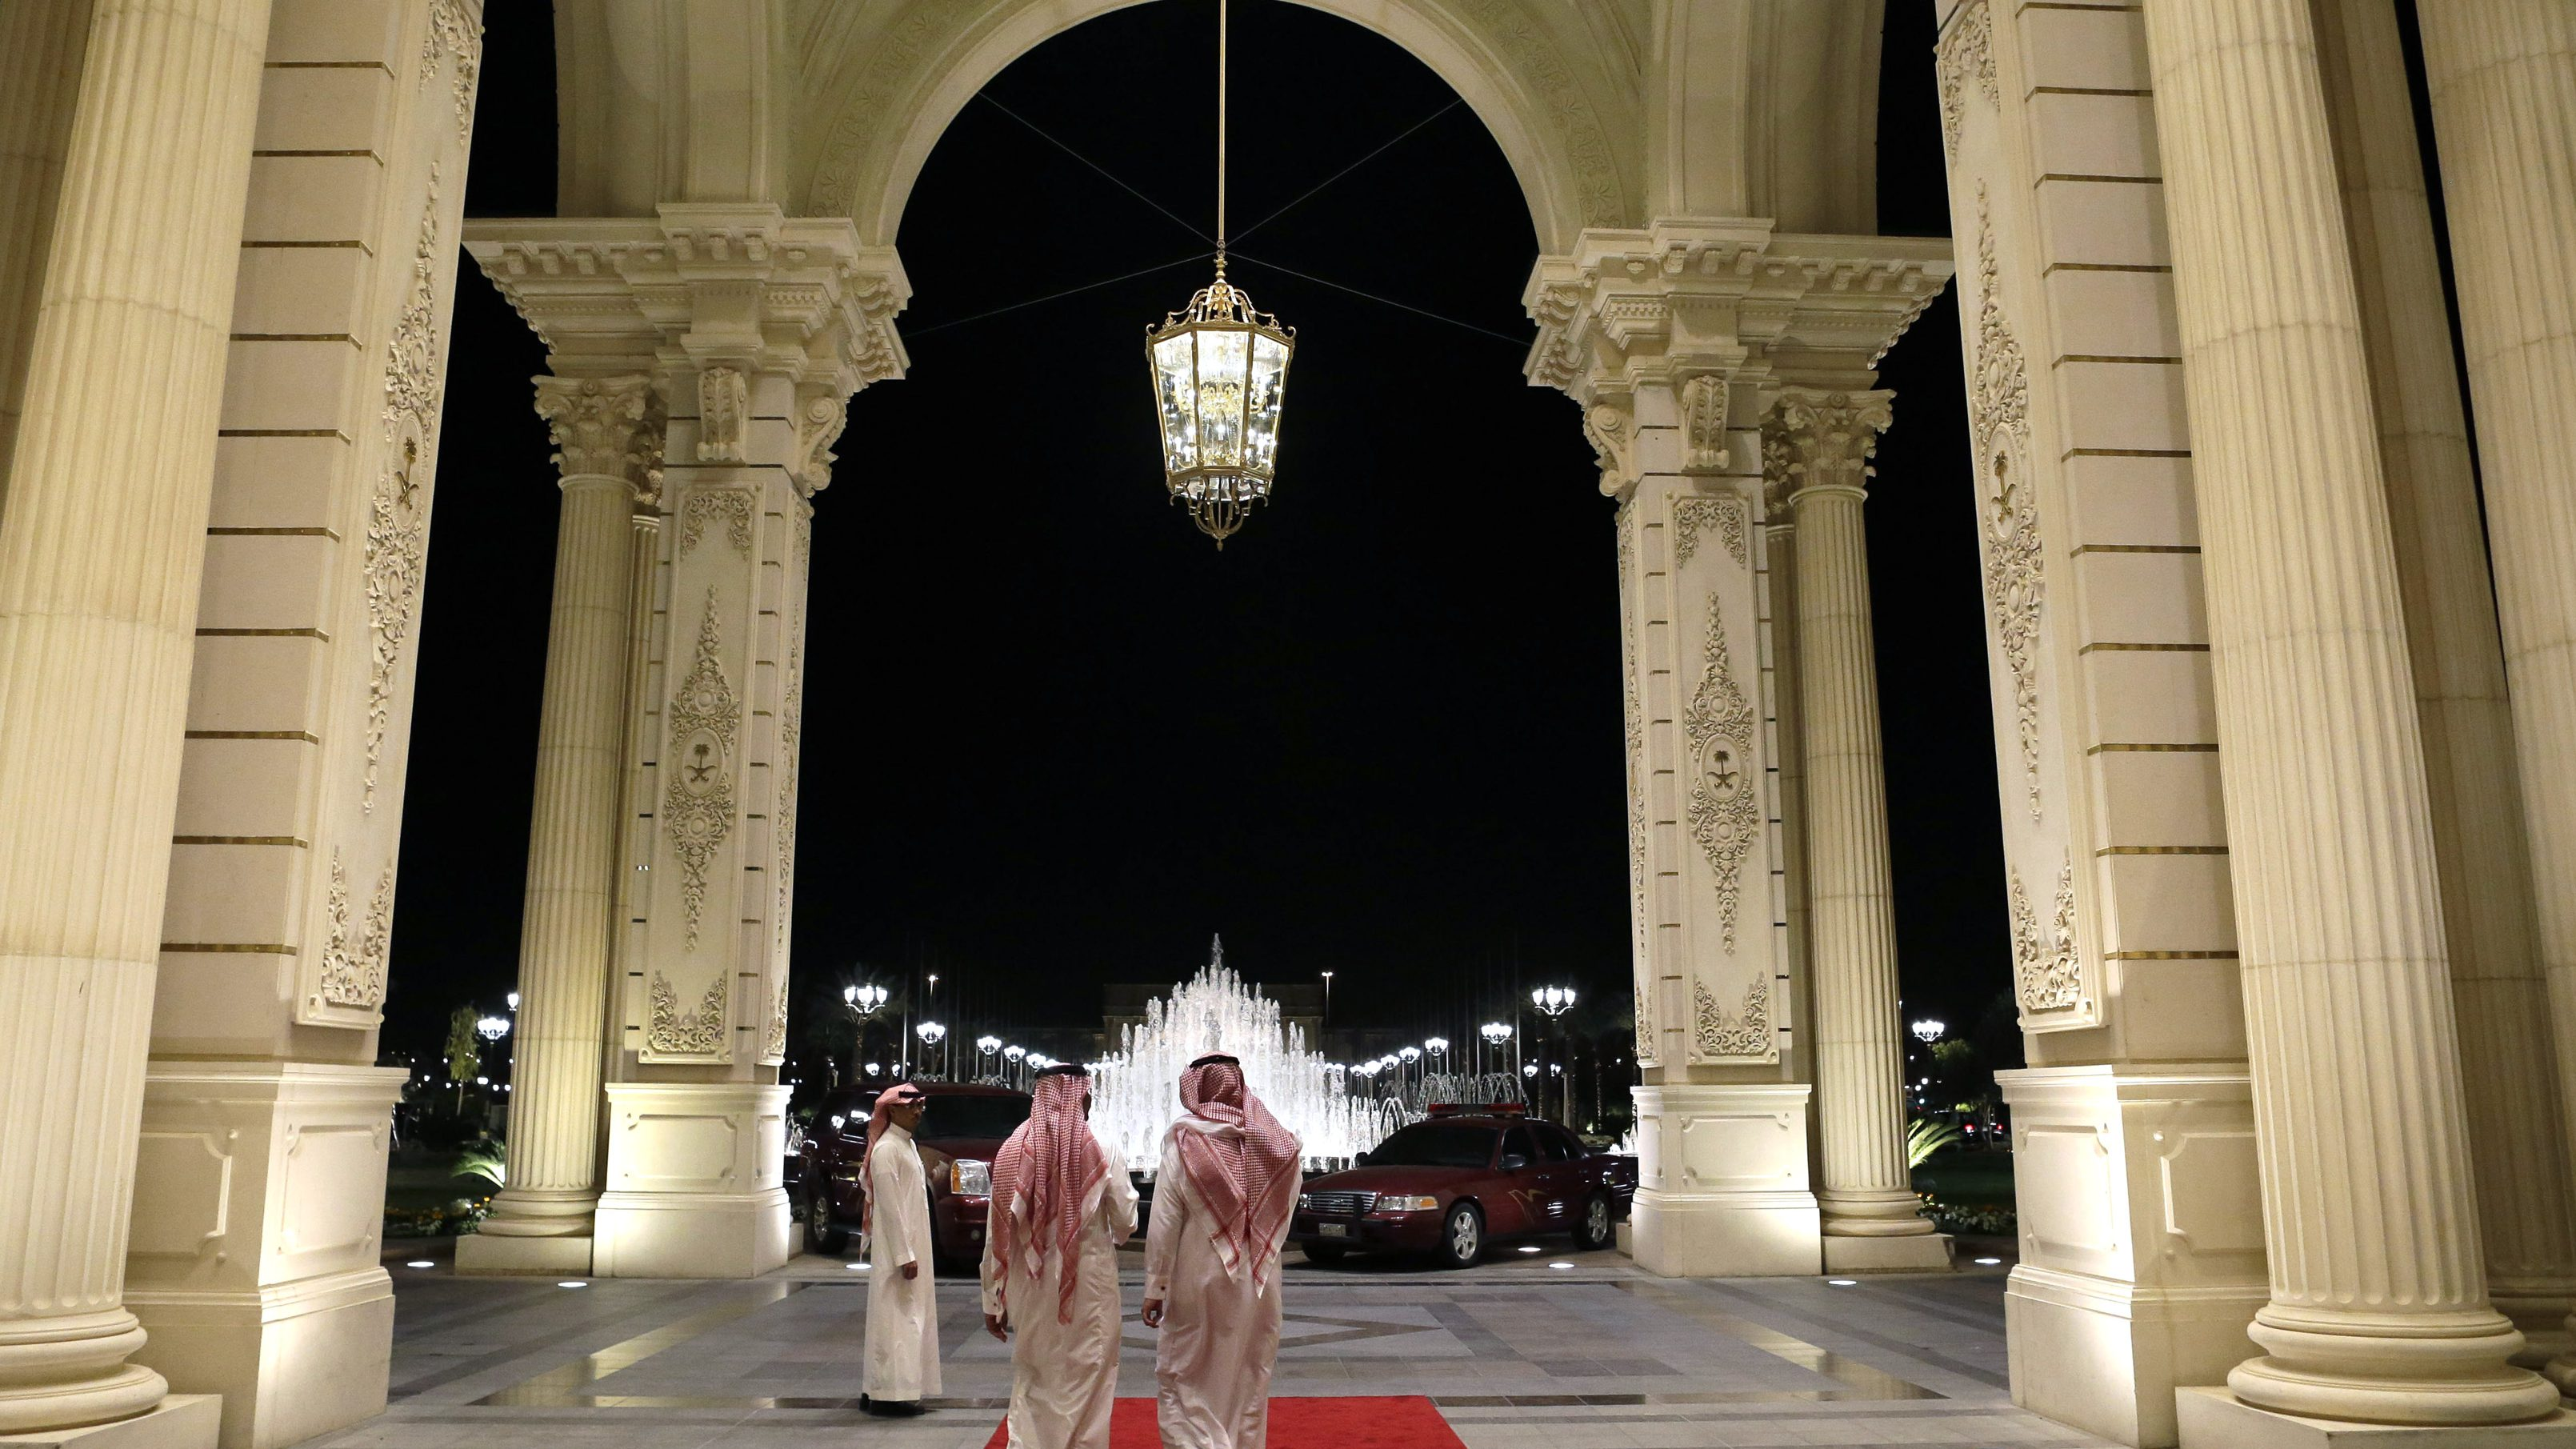 Saudi men walk at the entrance to the Ritz-Carlton Hotel, where U.S. Secretary of State John Kerry is staying in Riyadh March 4, 2013.  REUTERS/Jacquelyn Martin/Pool (SAUDI ARABIA - Tags: POLITICS) - GM1E9341NPU01